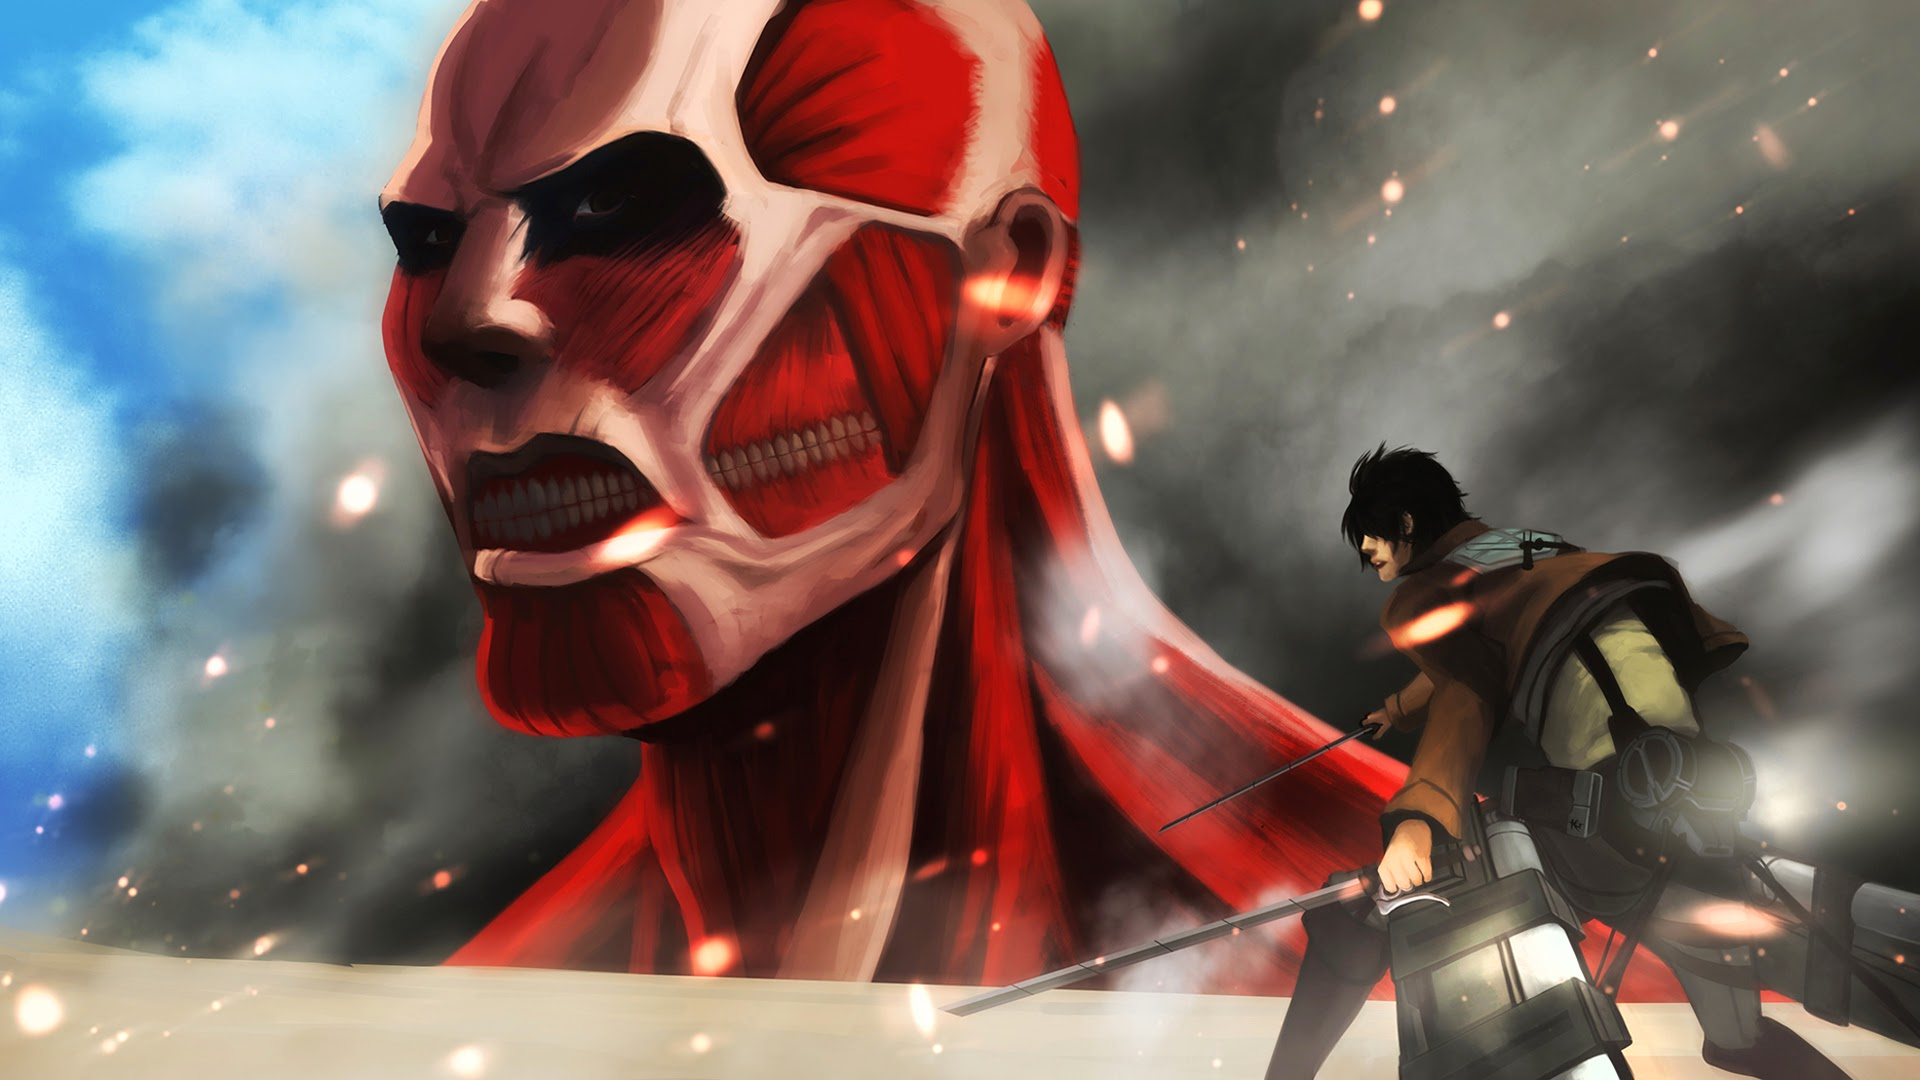 Eren Colossal Titan Attack on Titan 5o Wallpaper HD